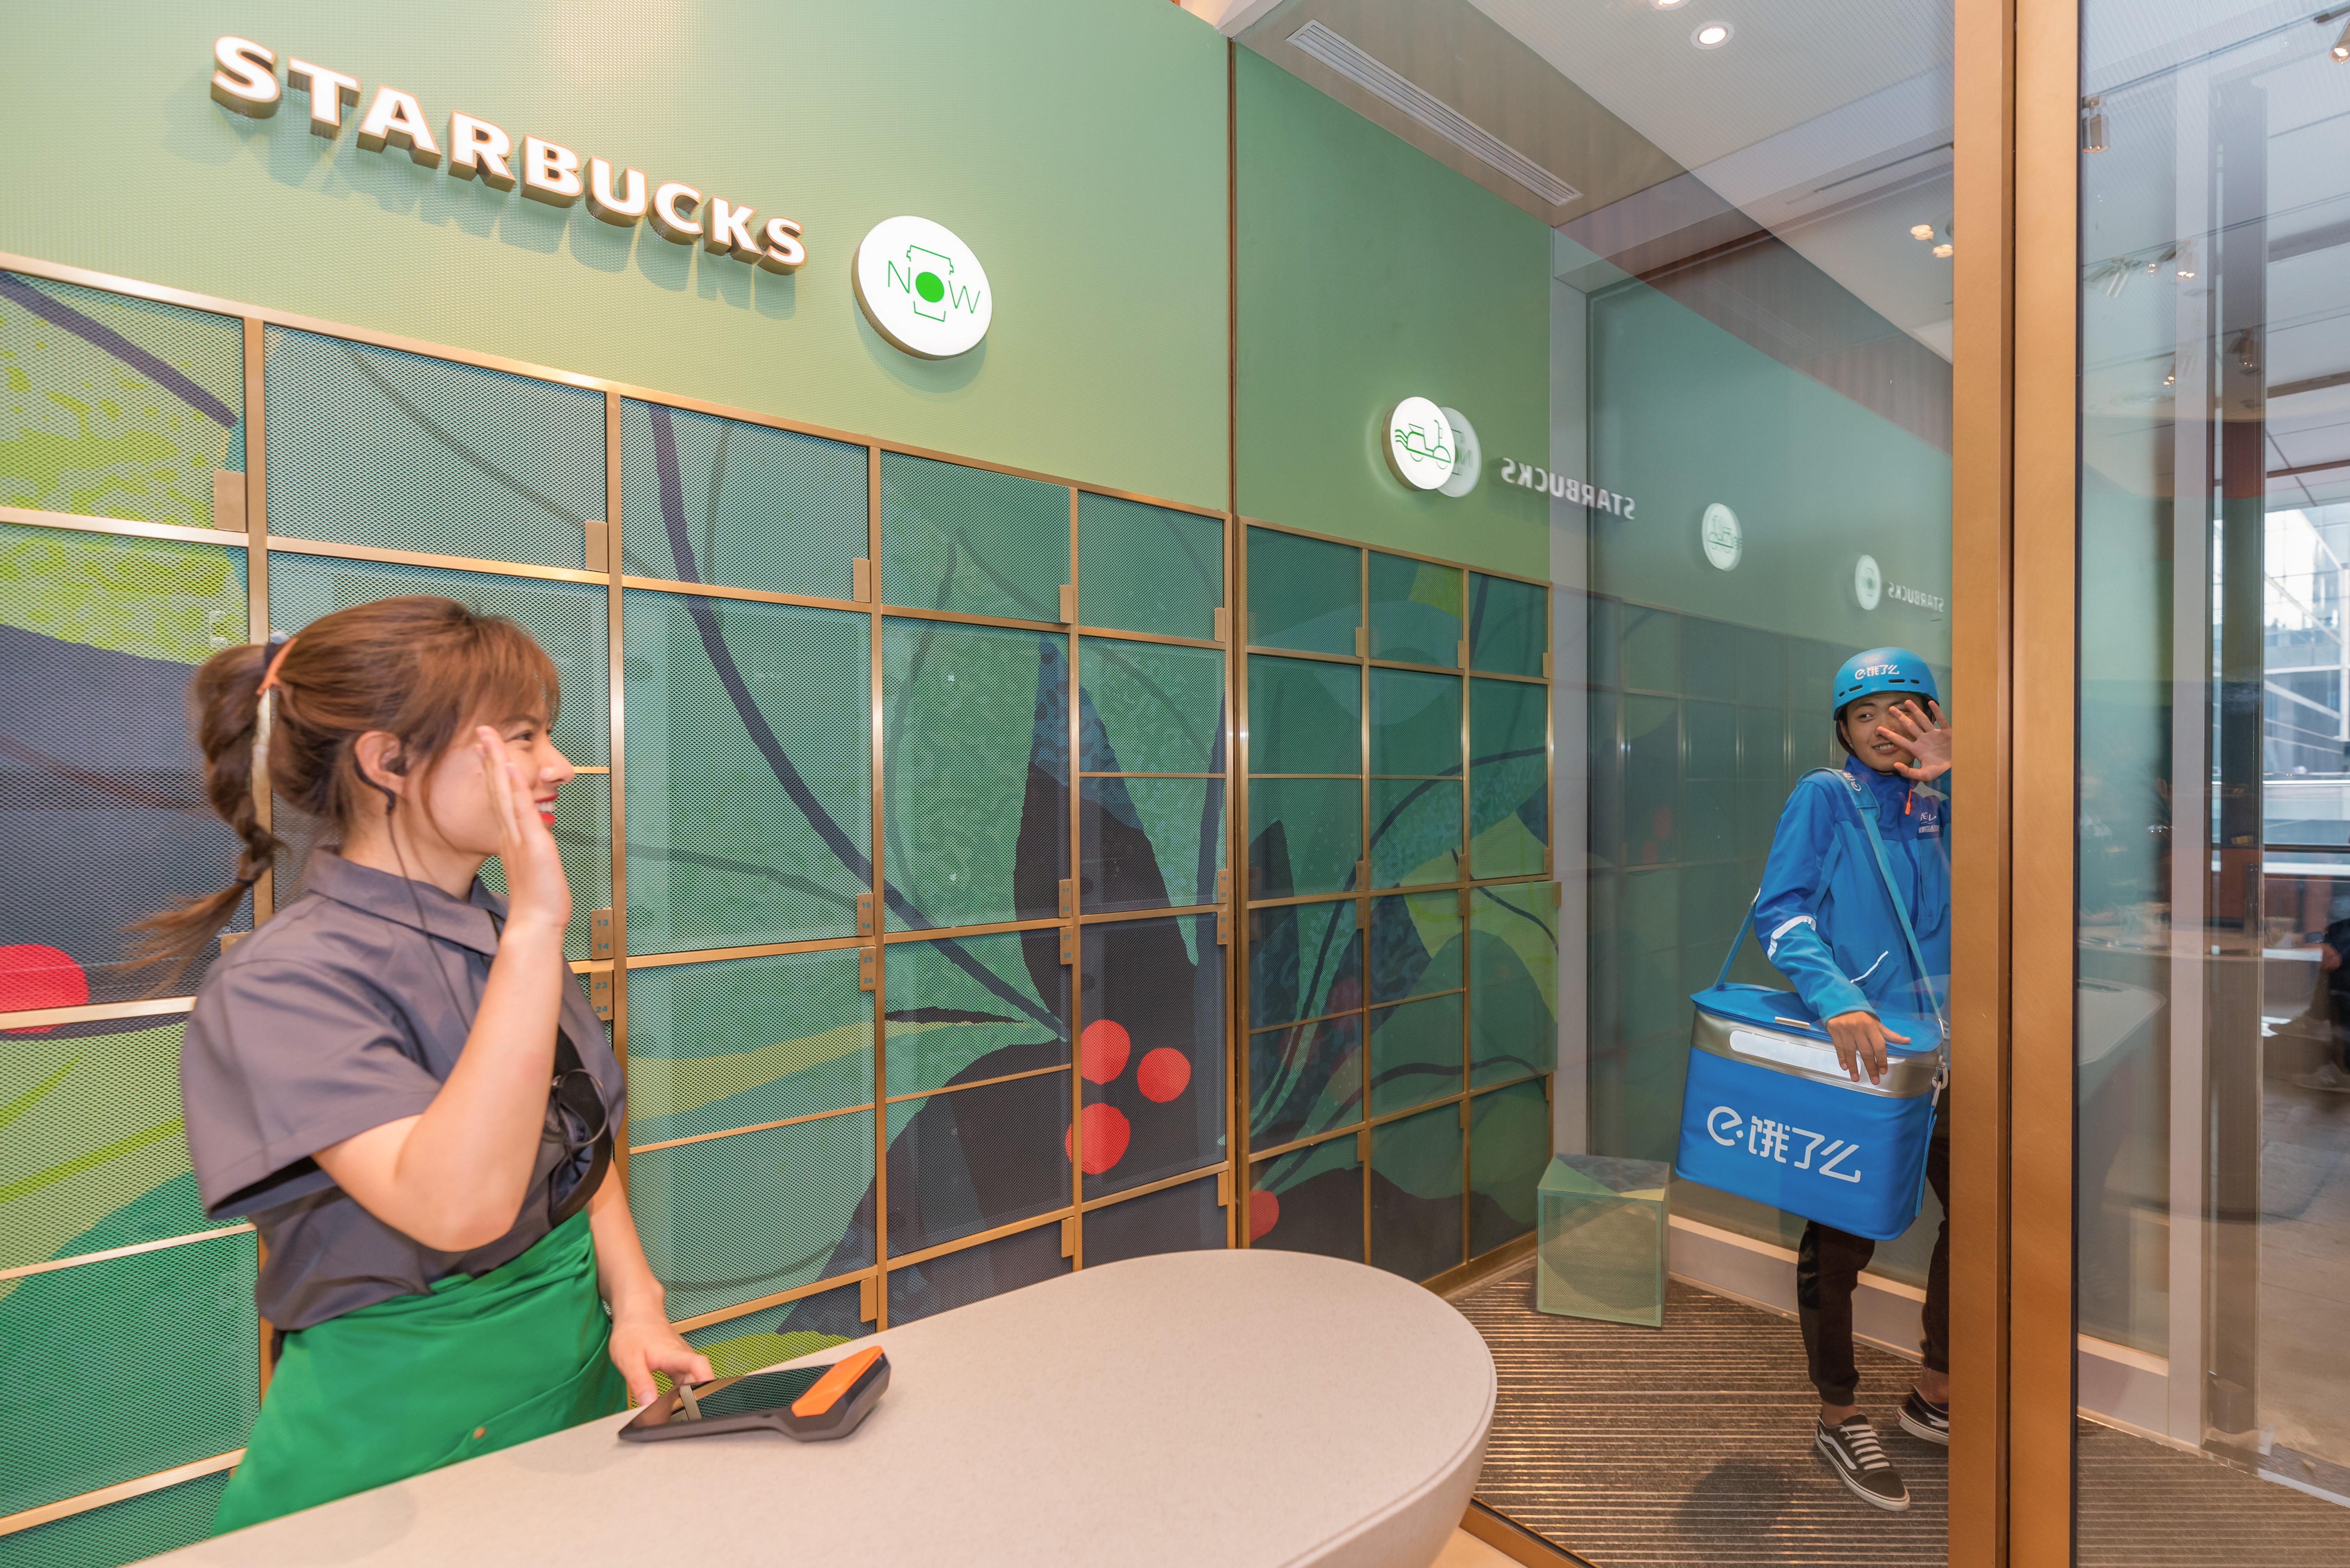 Starbucks barista waving goodbye to delivery girl